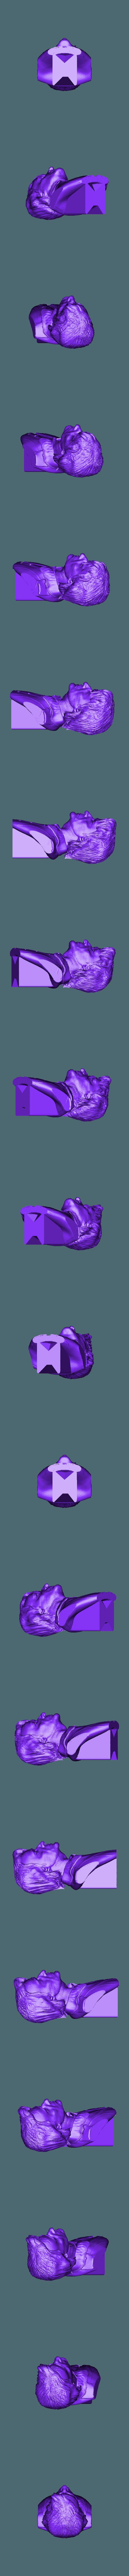 Arthur Fleck Joker Bust.stl Télécharger fichier STL gratuit Buste de Joker • Design à imprimer en 3D, 3DArt